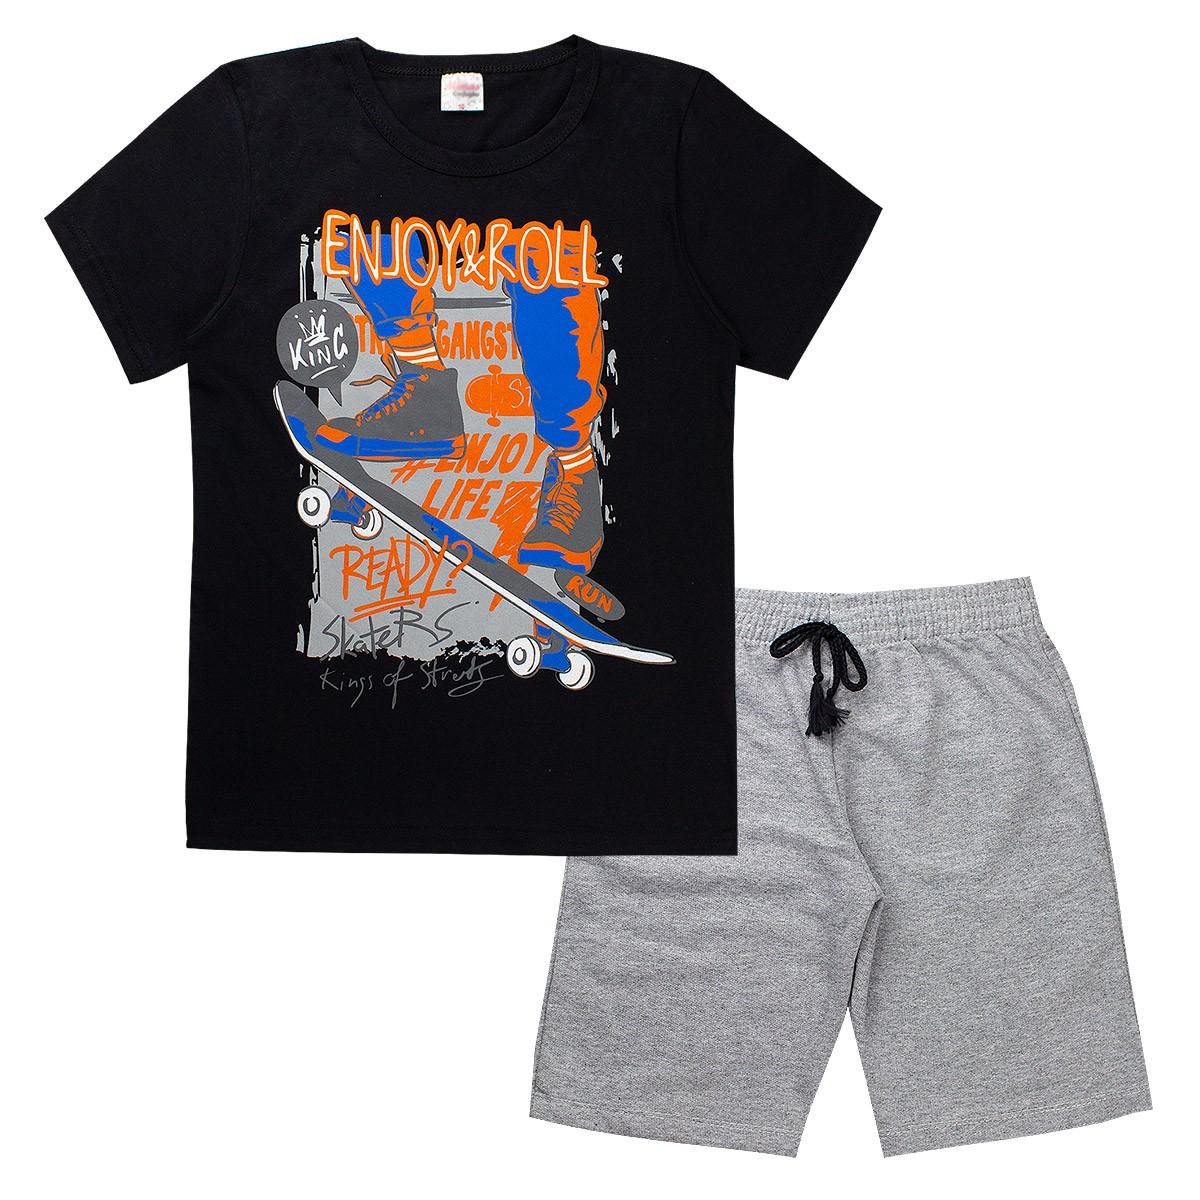 Conjunto Infantil/Juvenil Enjoy & Roll Preto Moderna